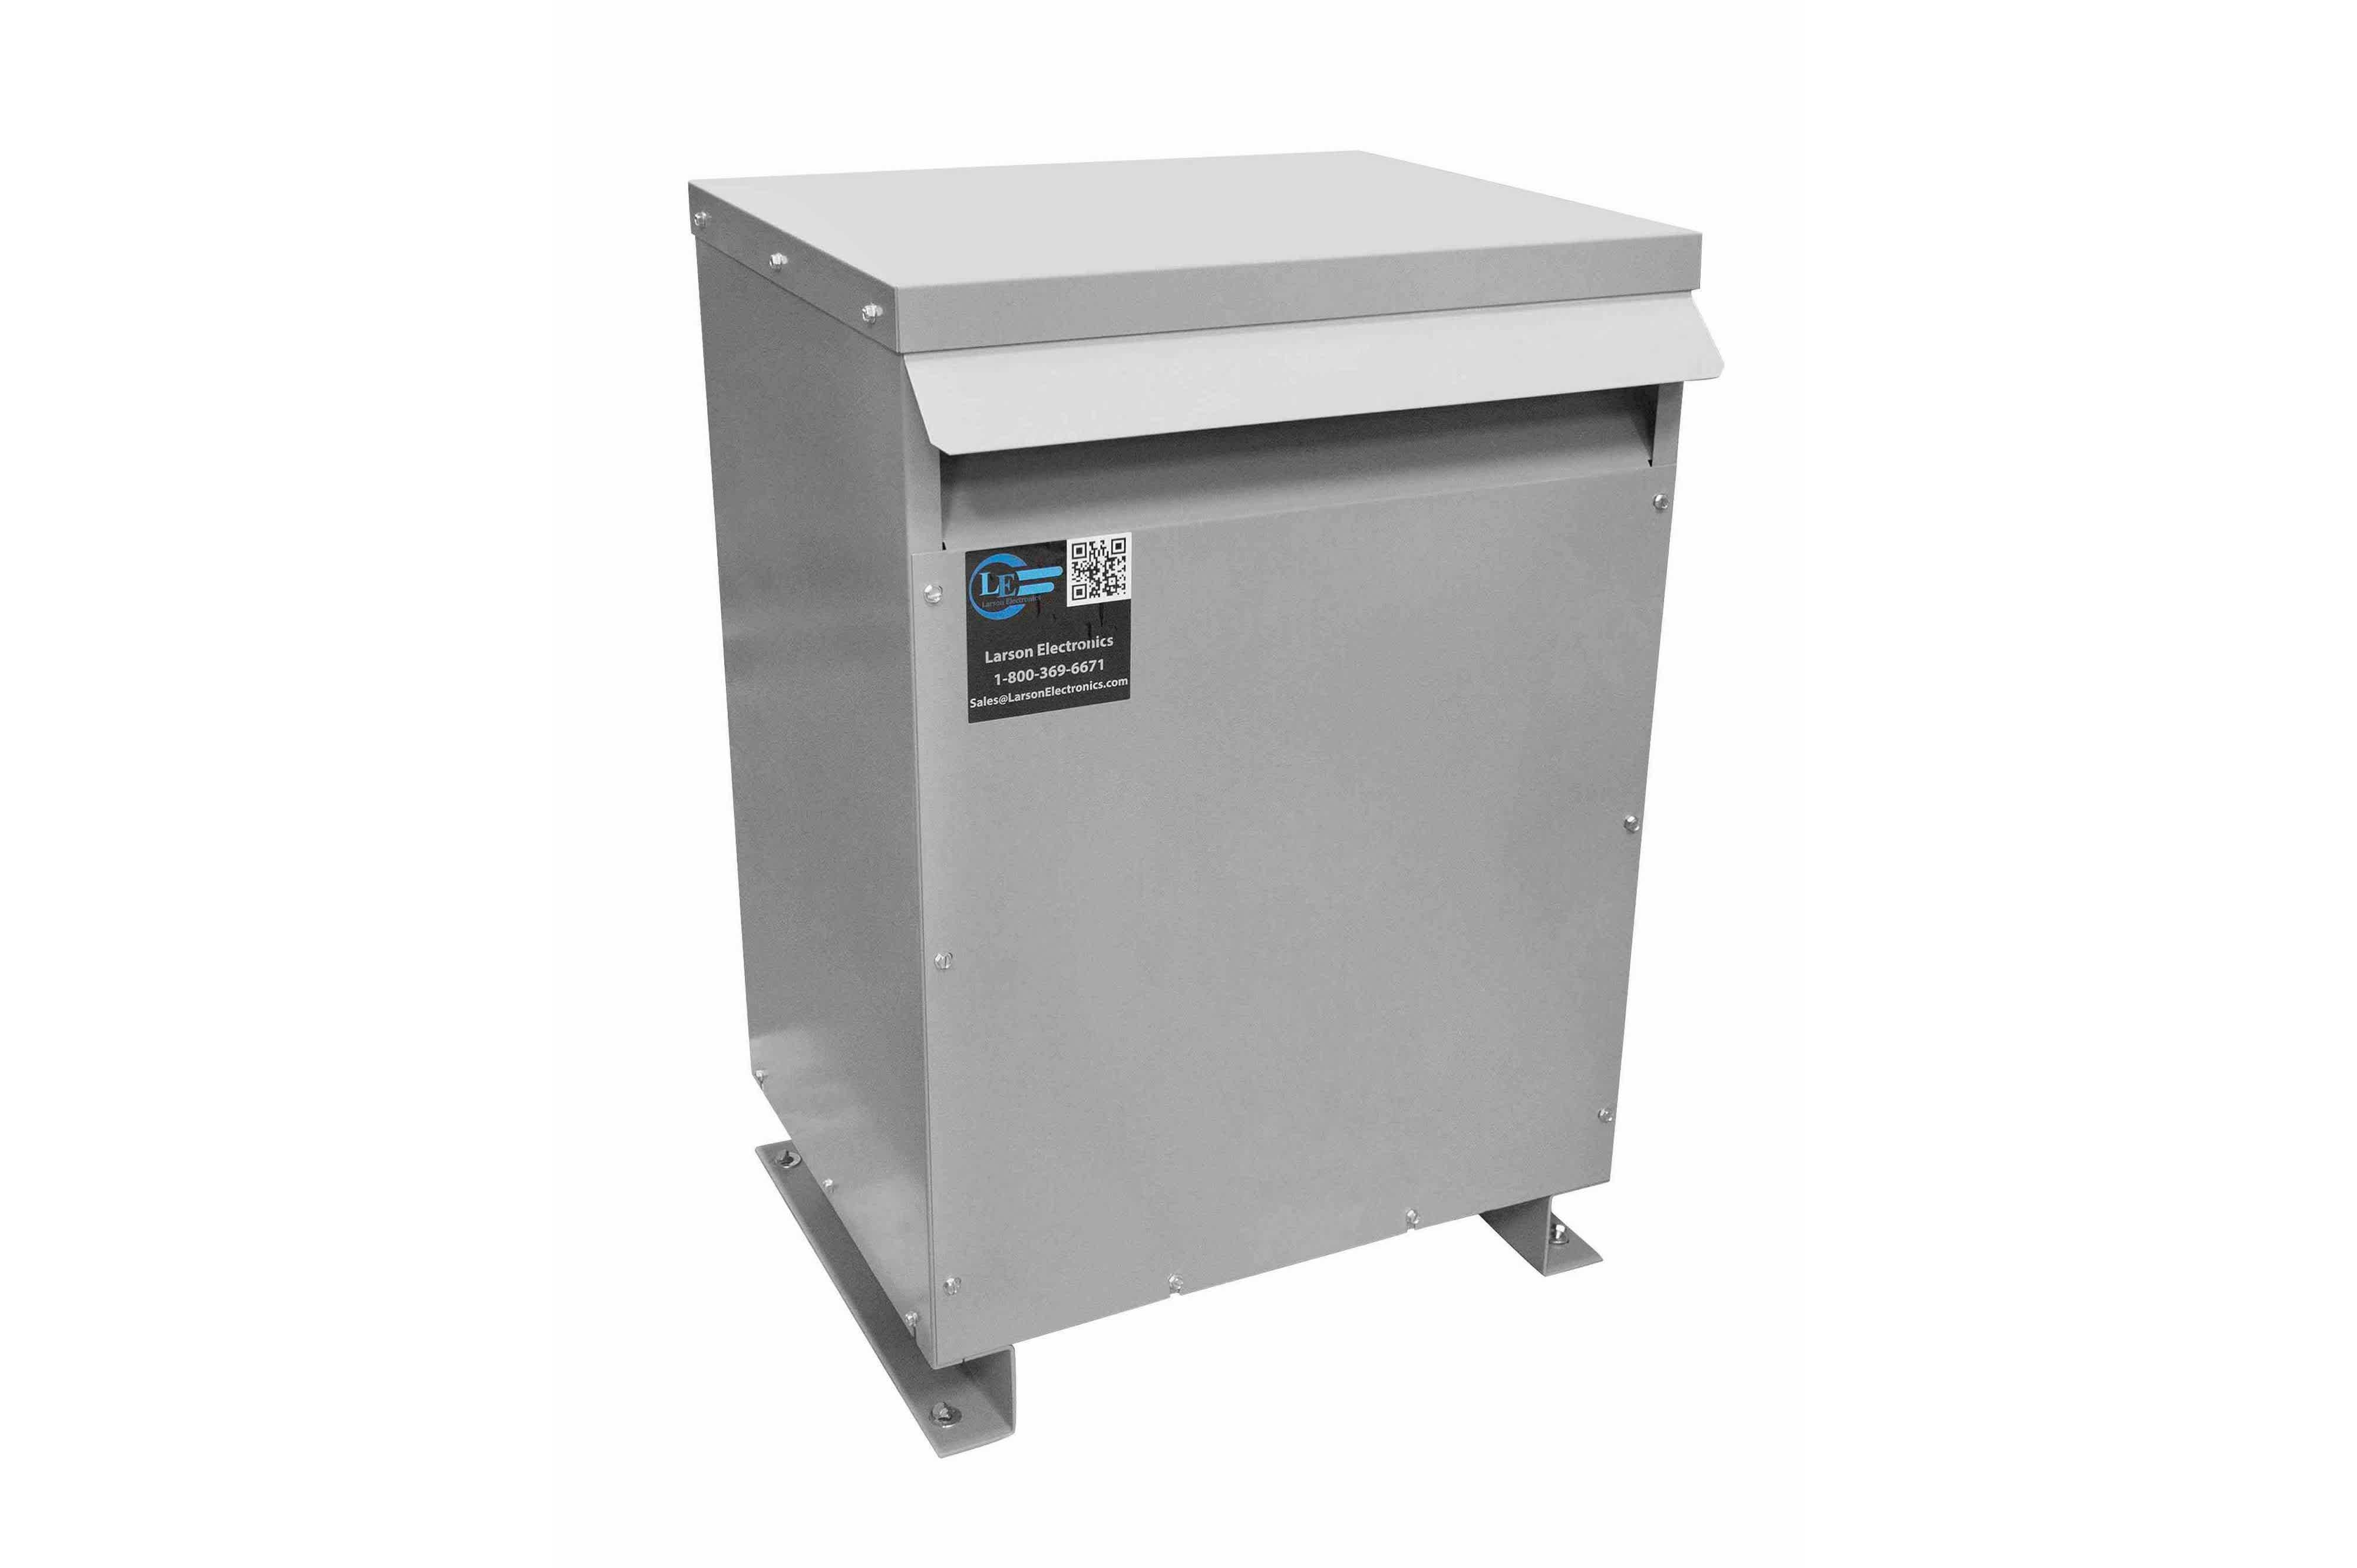 900 kVA 3PH Isolation Transformer, 415V Wye Primary, 208V Delta Secondary, N3R, Ventilated, 60 Hz